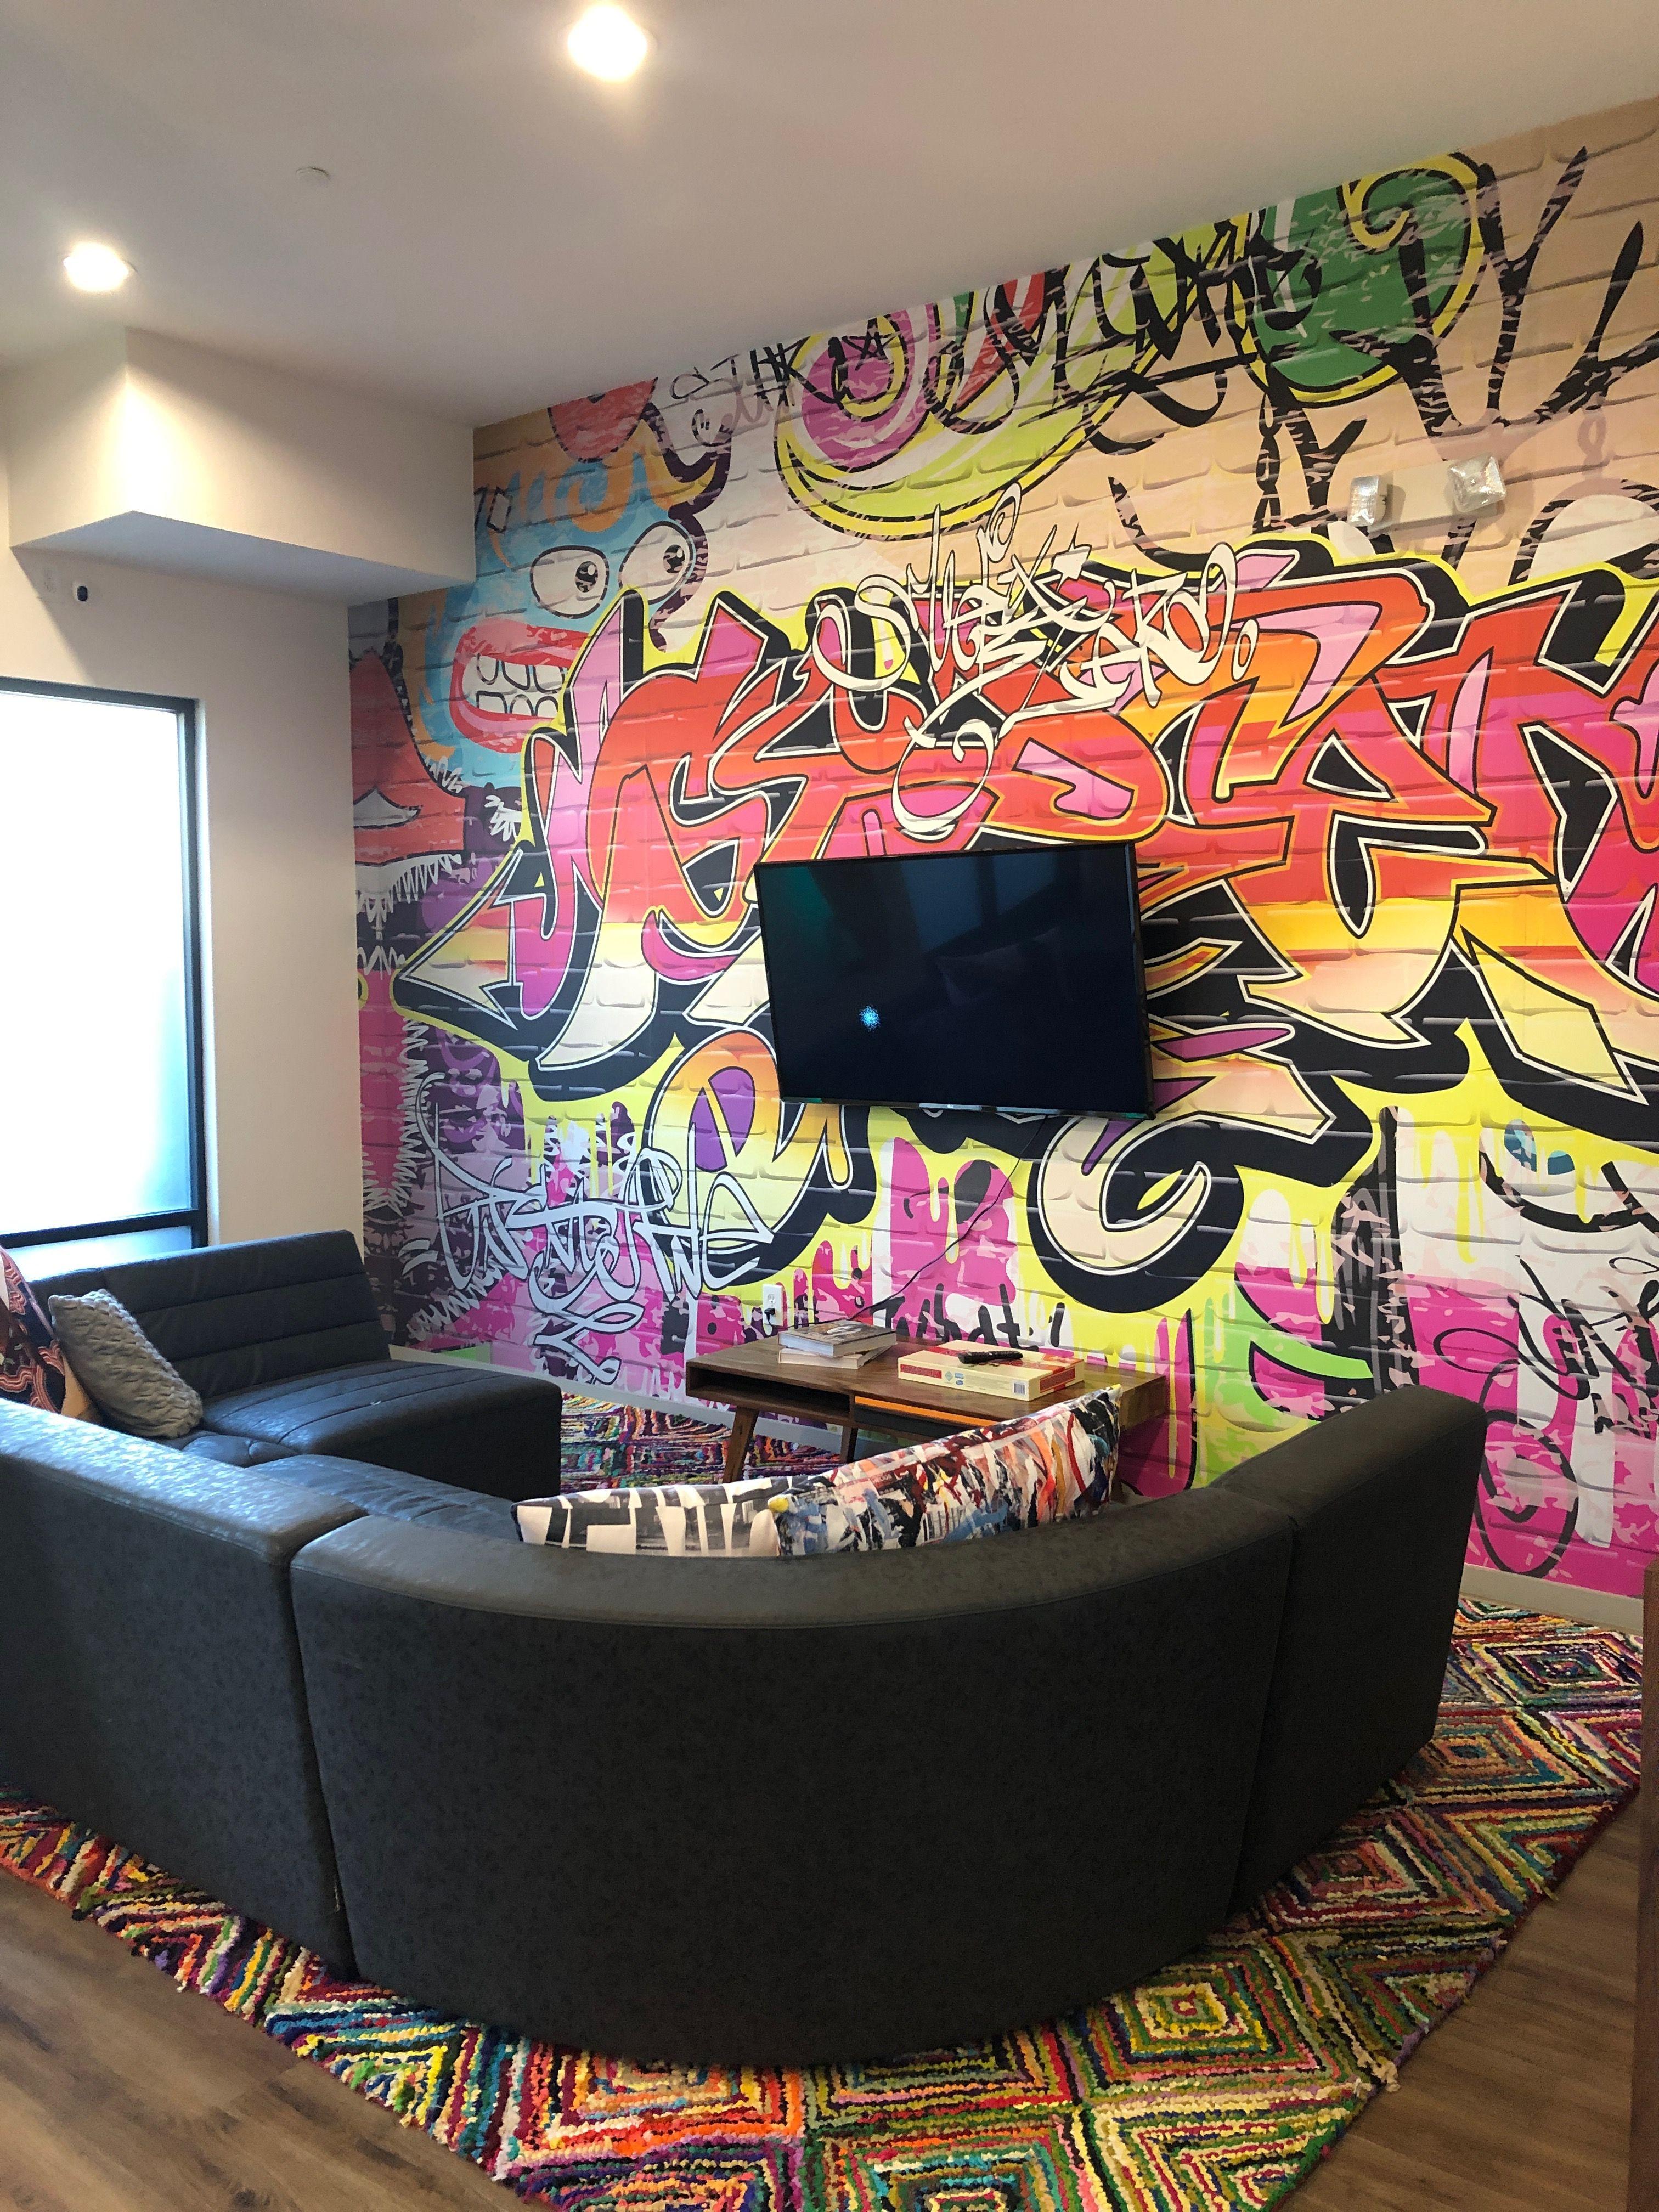 Wall Art Graffiti Brick Wall Accent Wall Diy Home Decor Bold Pop Street Art Graffiti Room Home Room Design Home Decor